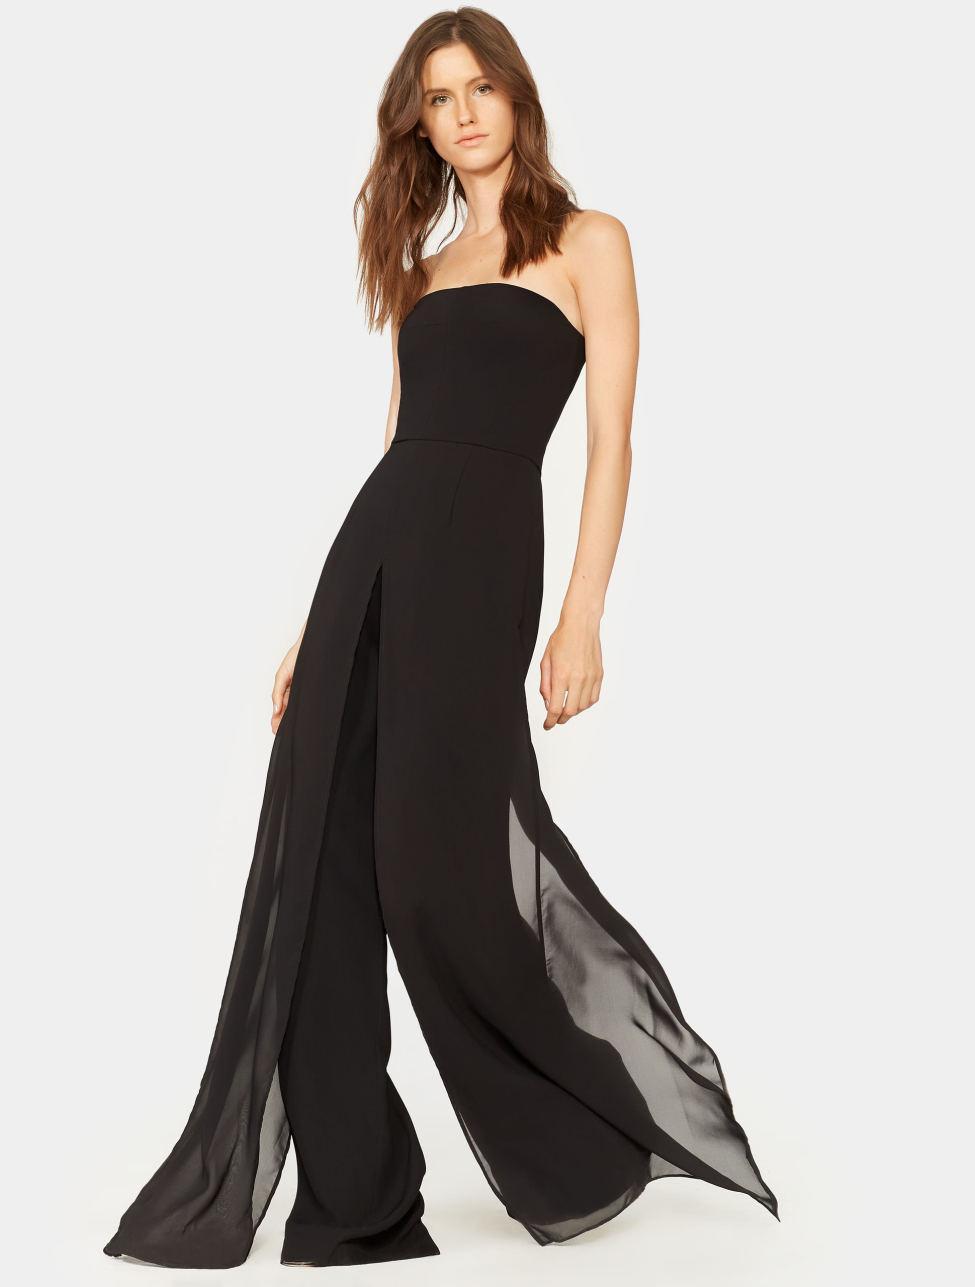 465839eb688d Lyst - Halston Chiffon Overlay Strapless Jumpsuit in Black